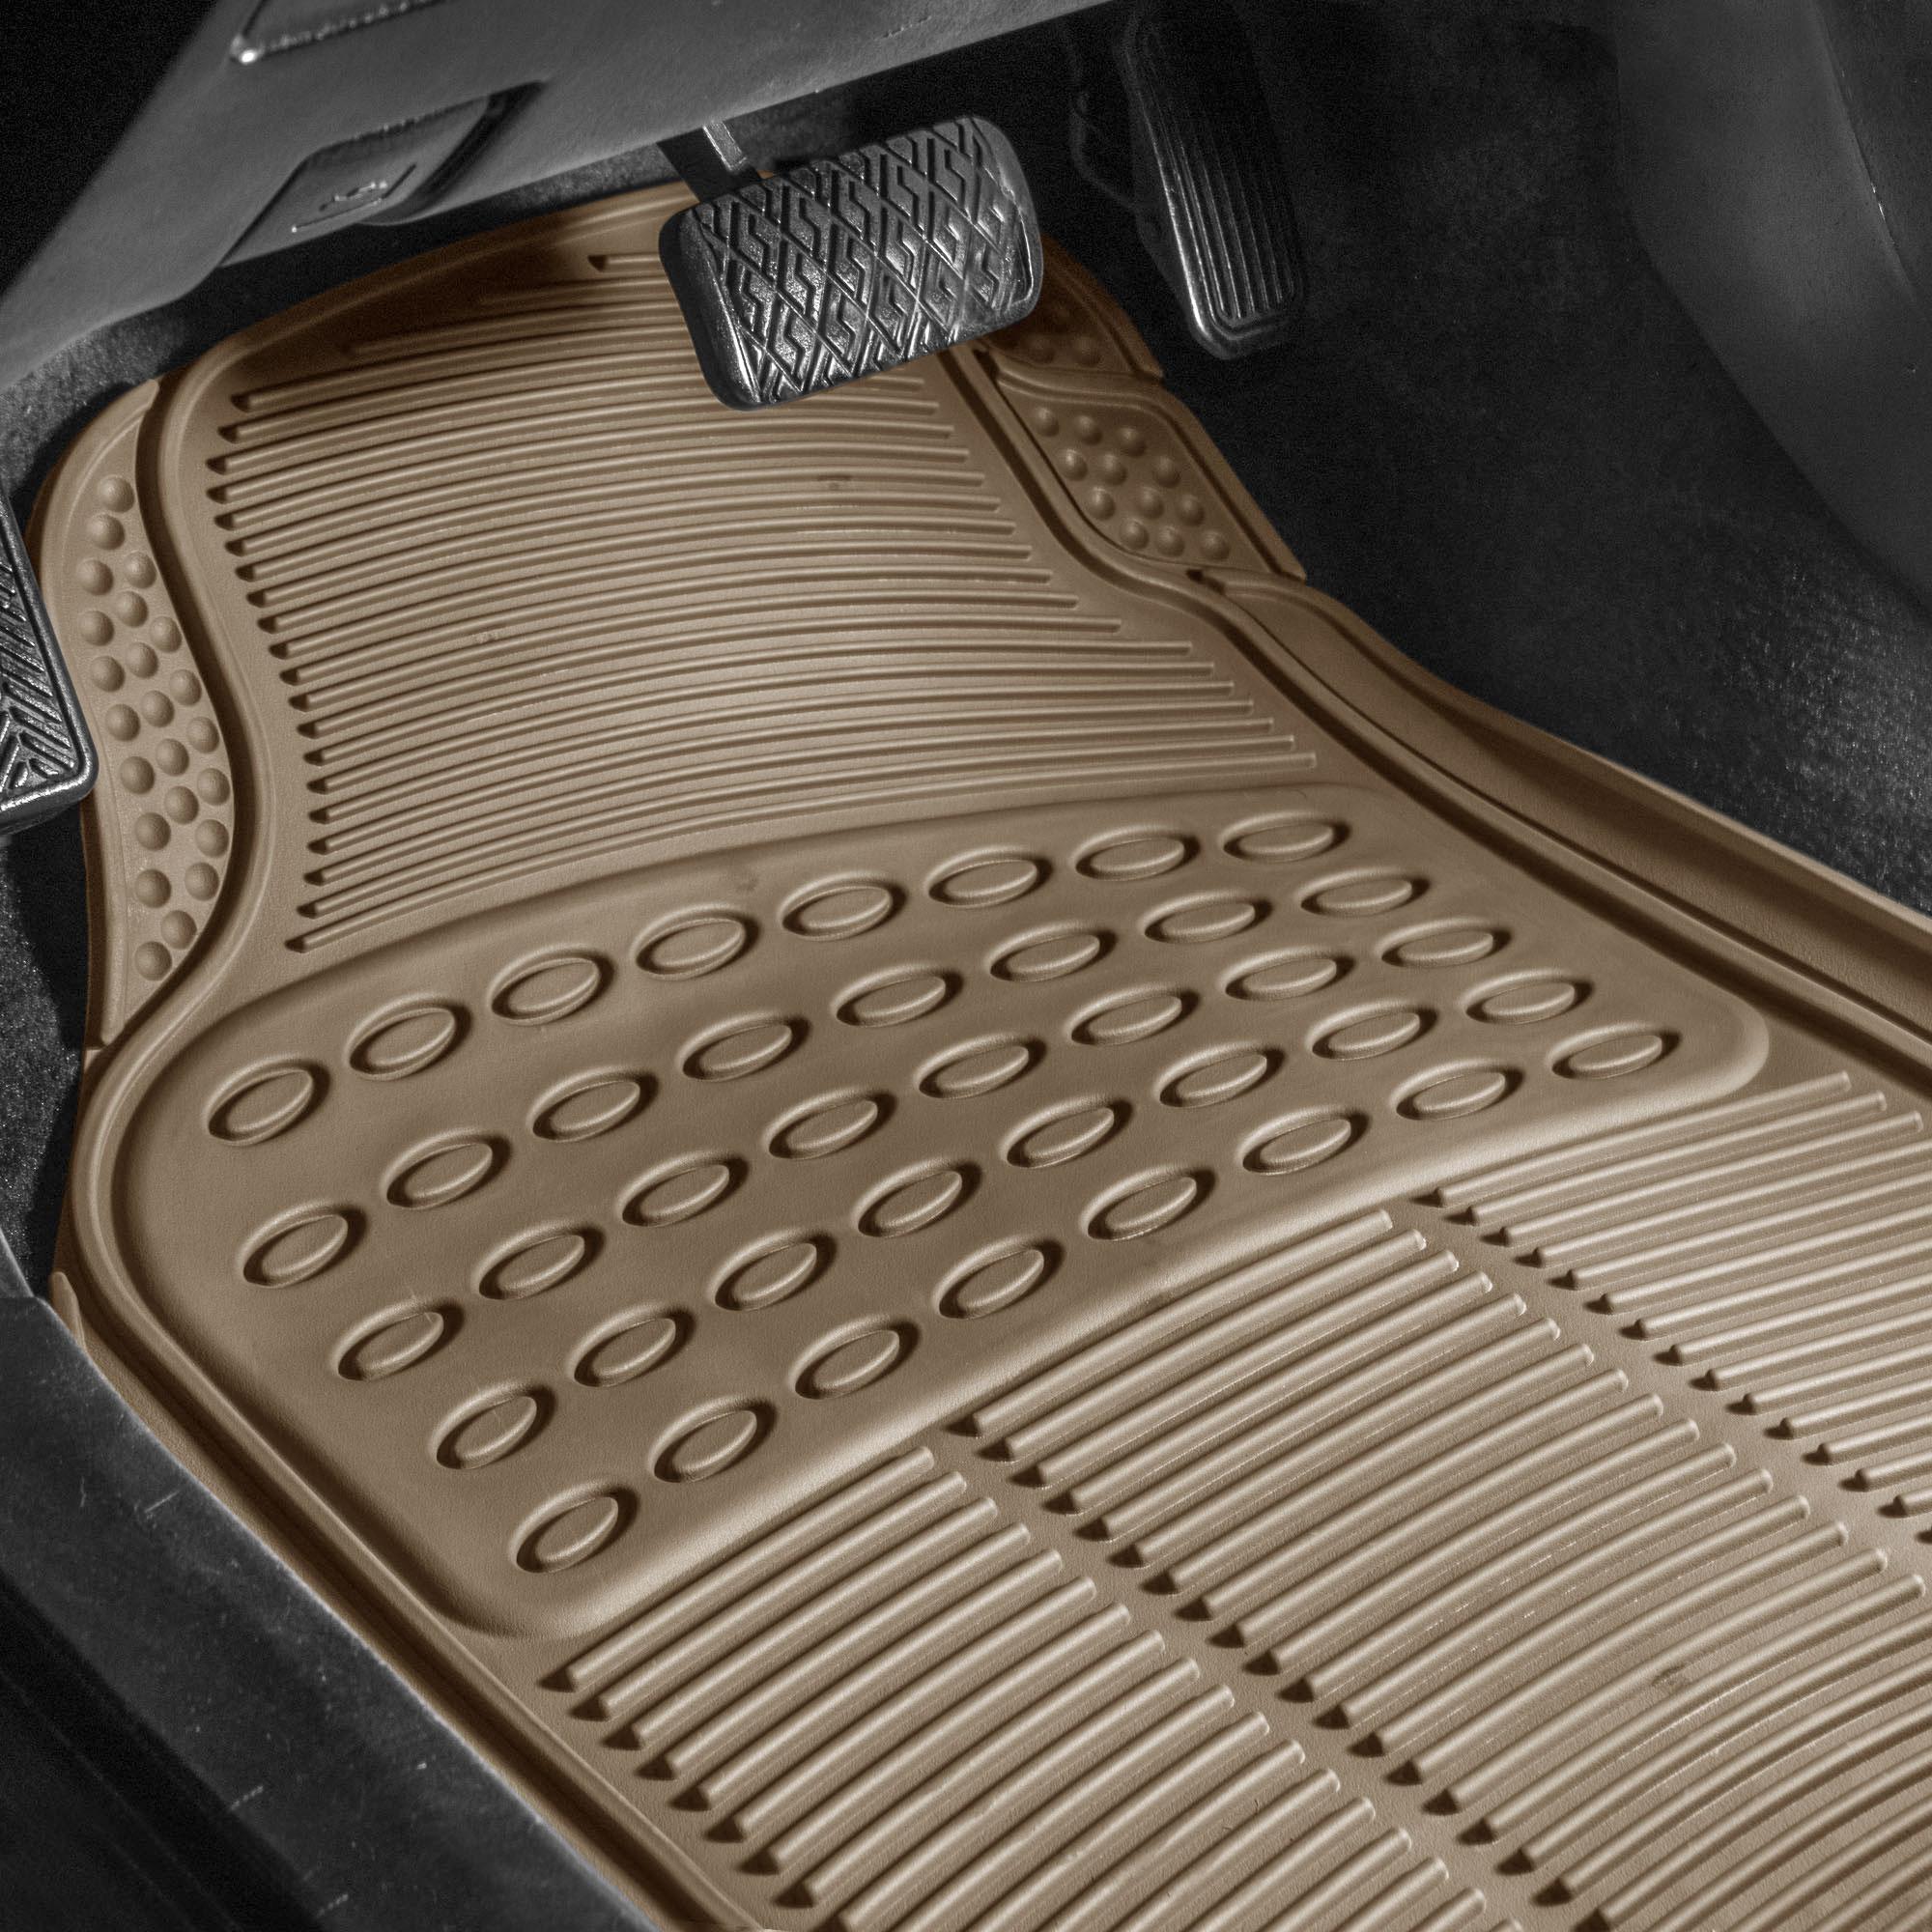 3pc-Floor-Mats-for-Auto-Car-SUV-Van-Heavy-Duty-3-Colors-w-Free-Gift thumbnail 5